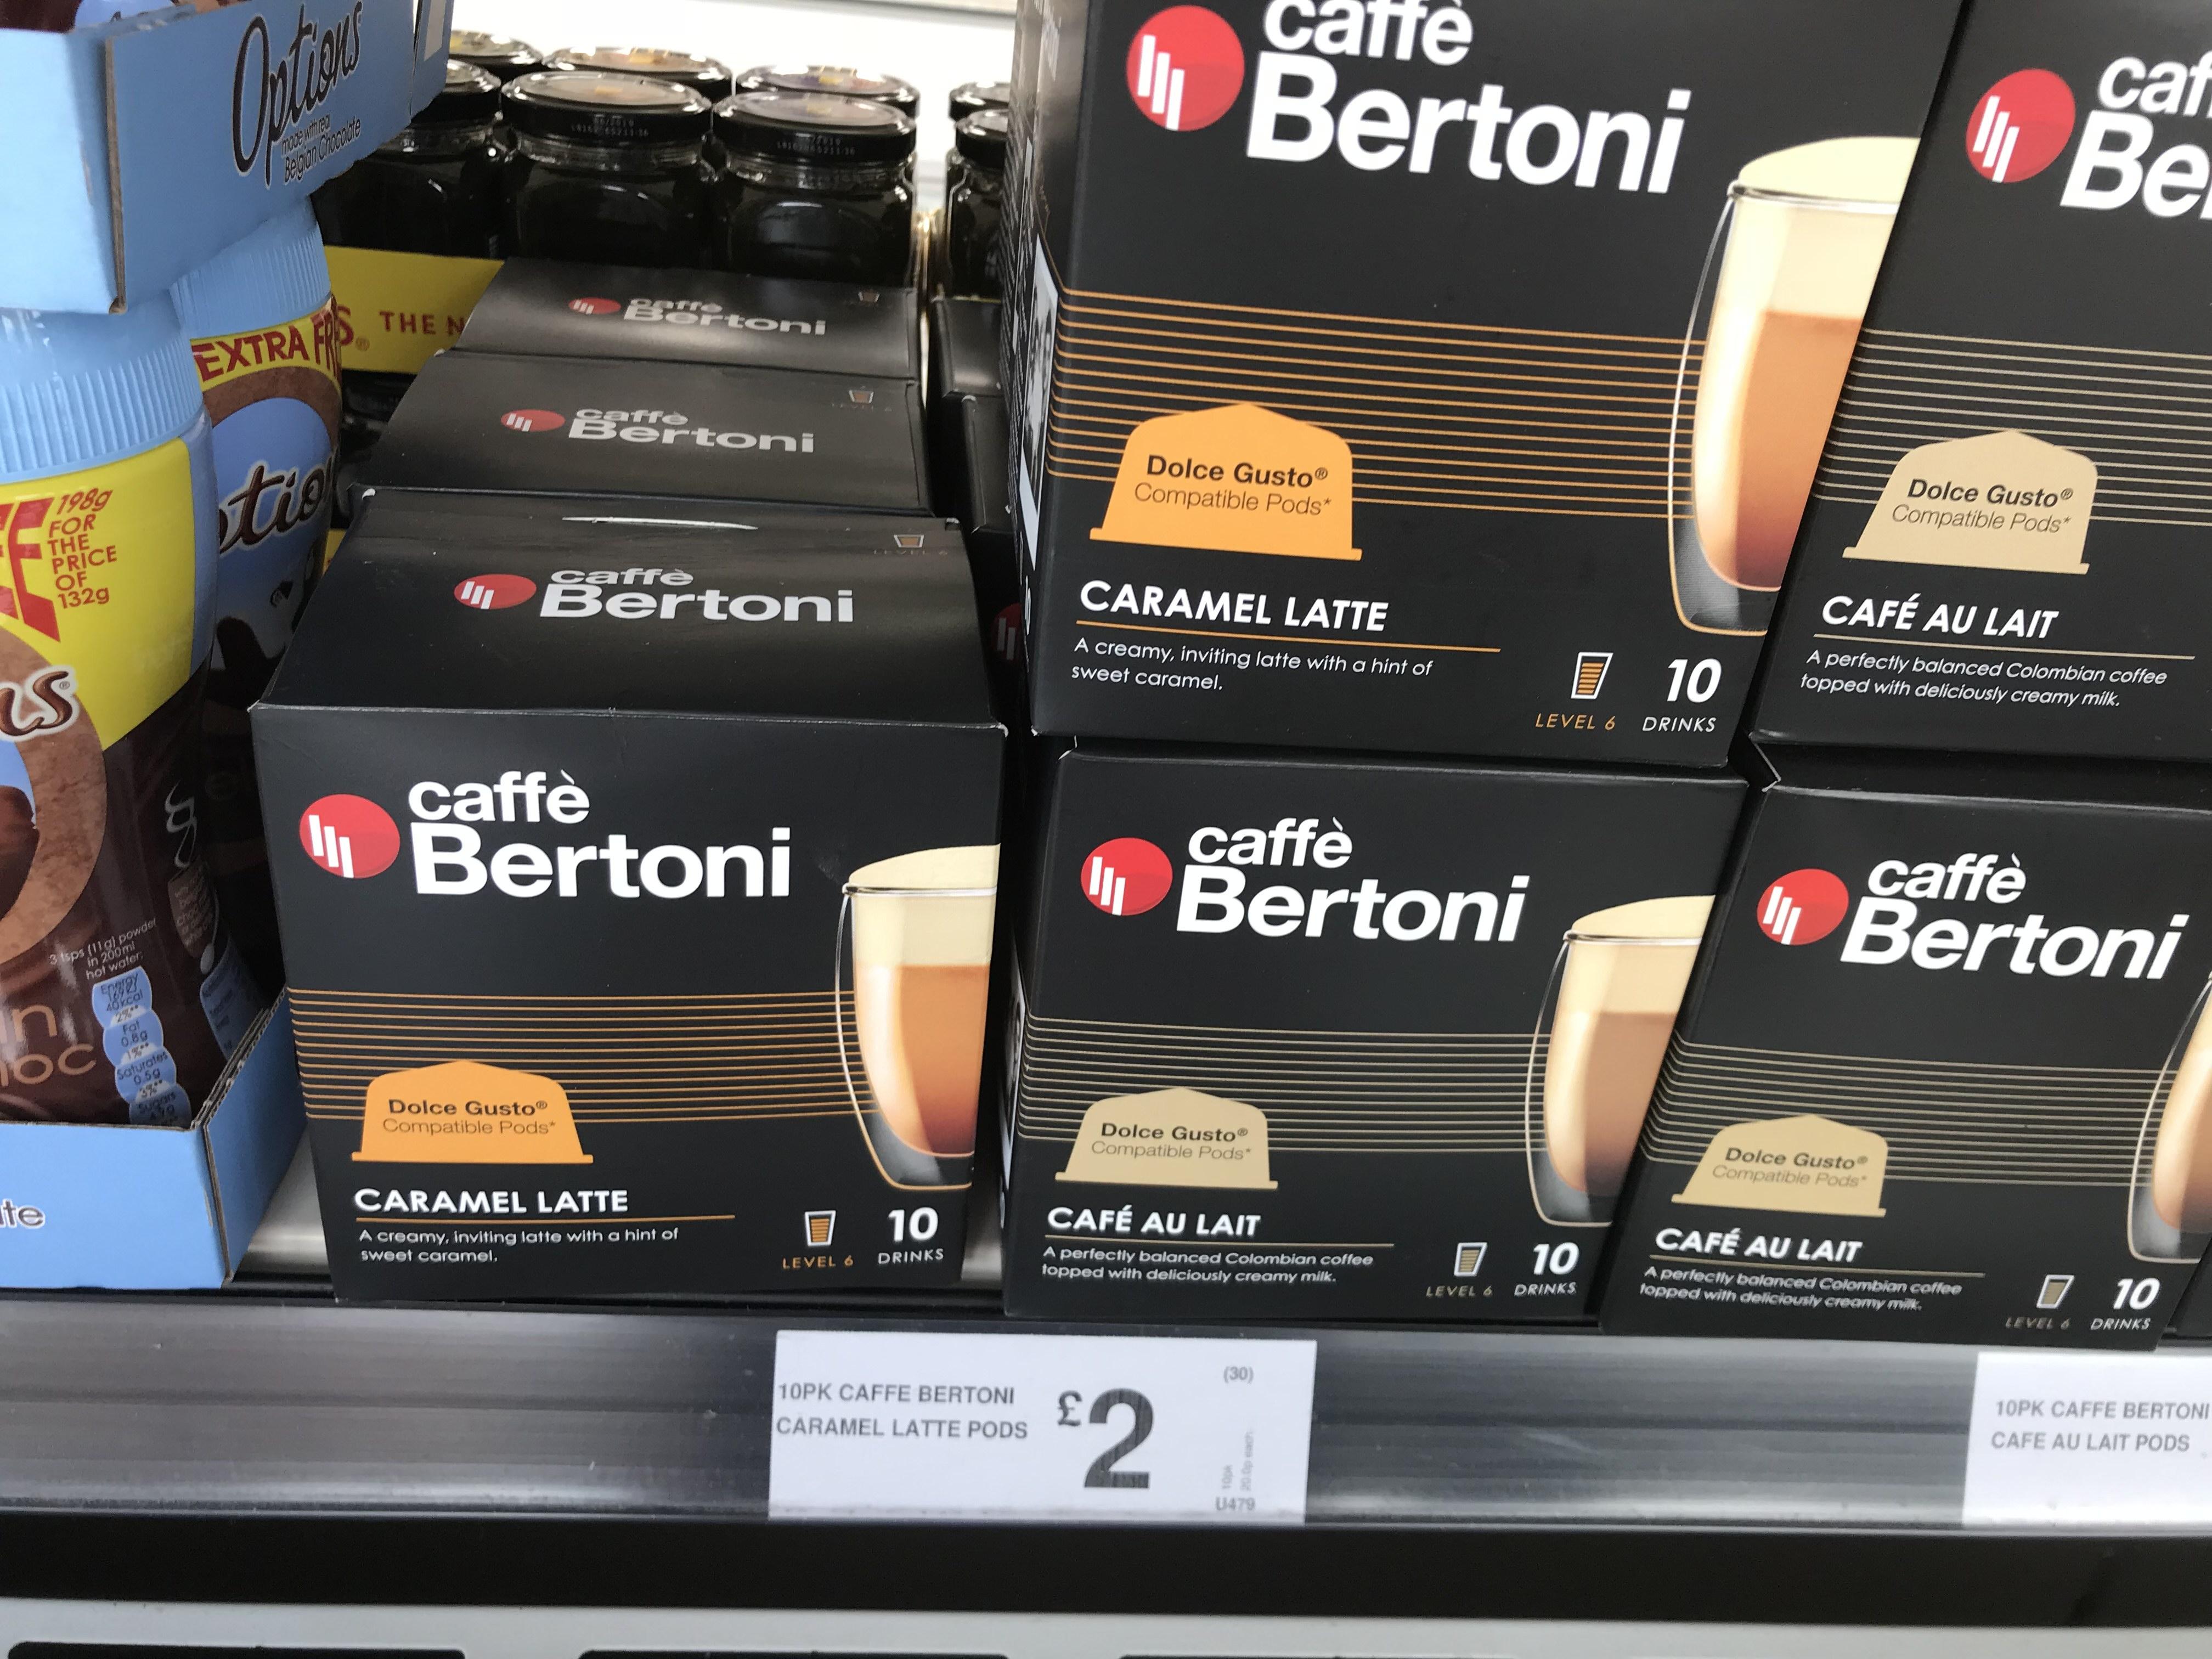 Caffè Bertoni coffee pods x 10 @ Farmfoods for £2